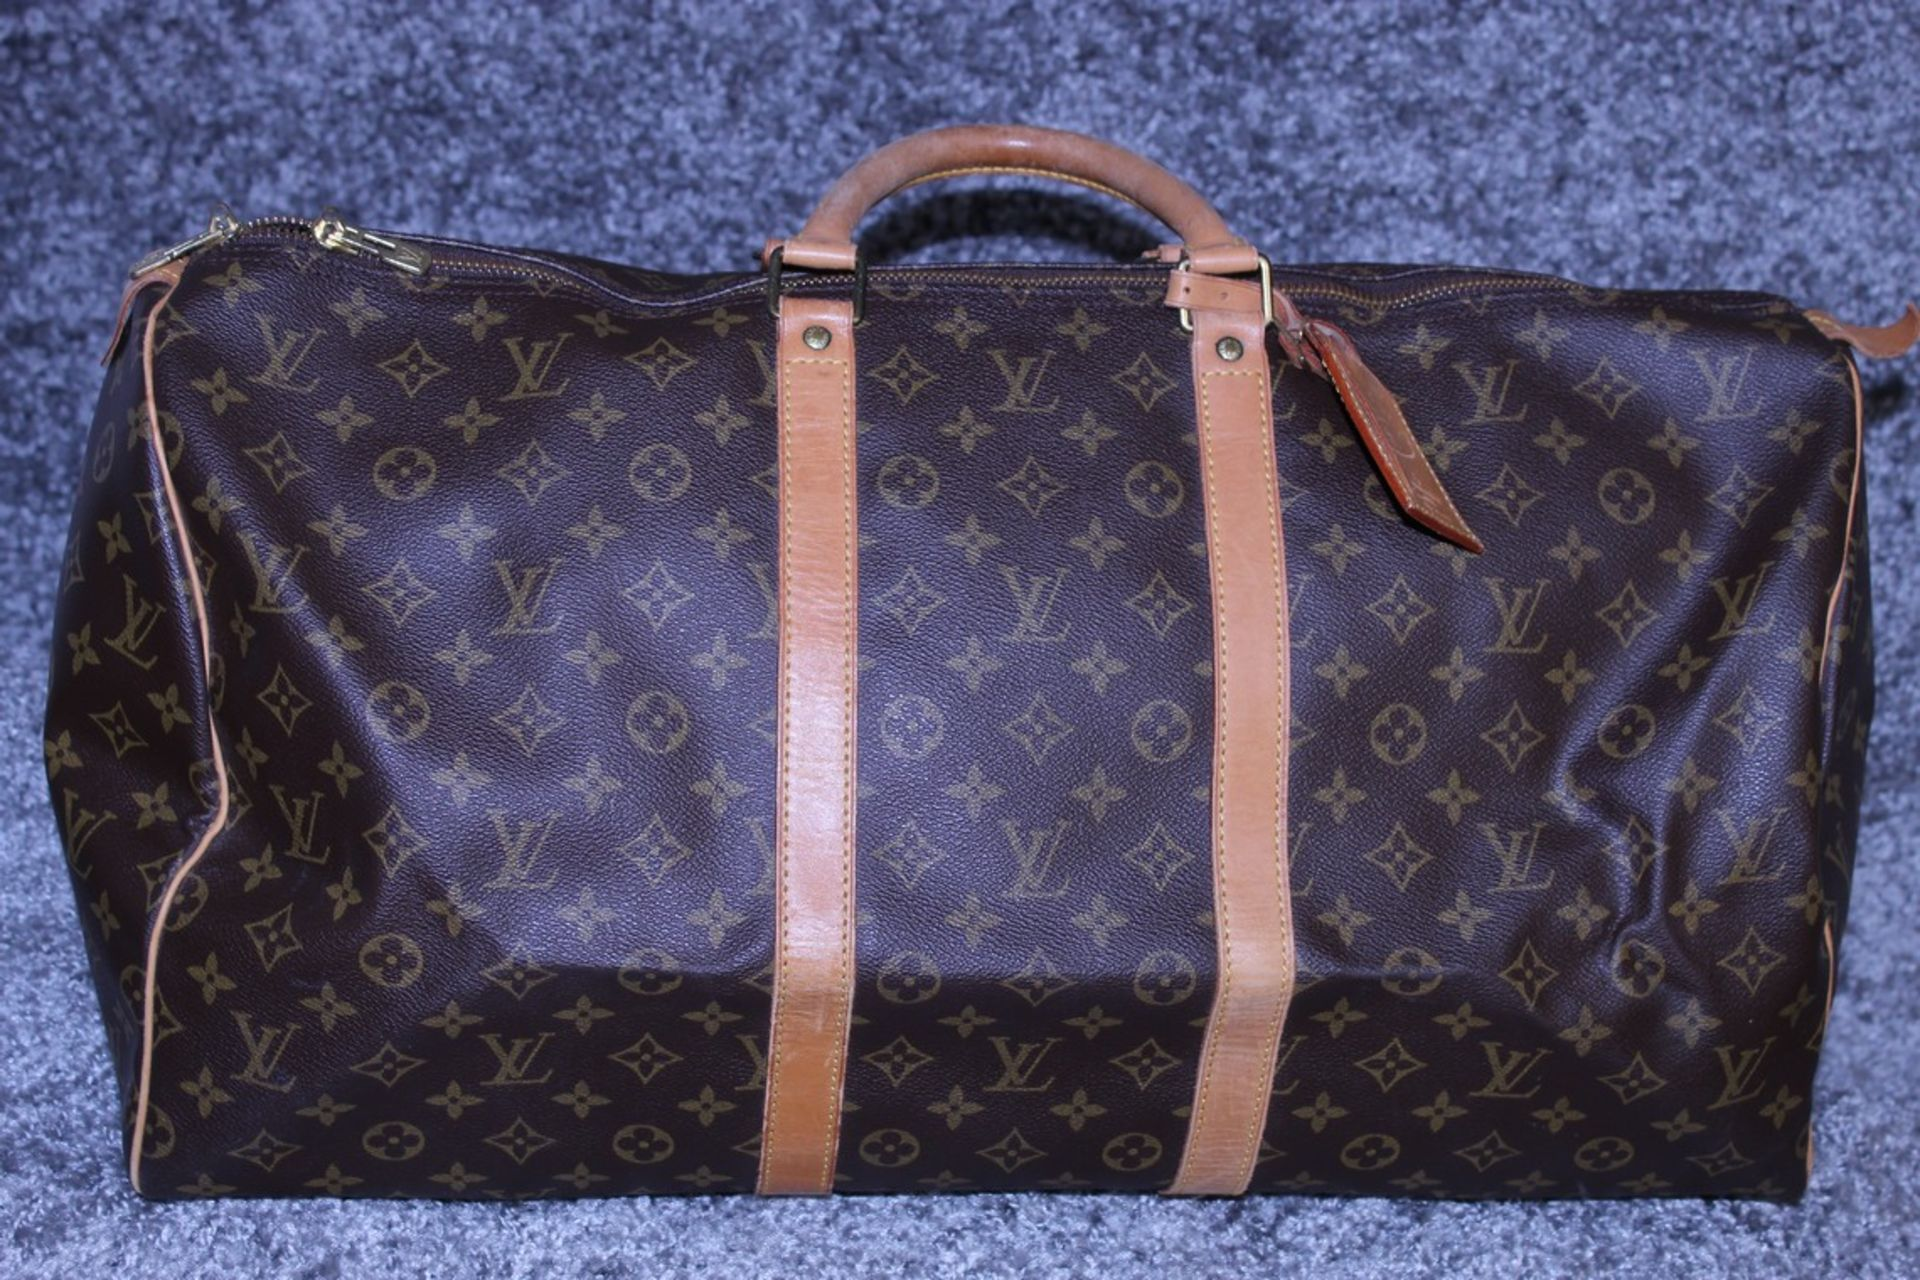 RRP £1,780 Louis Vuitton Keepall 55 Travel Bag, Brown Monogram Canvas, Vachetta Handles, 55X28X25Cm, - Image 2 of 5